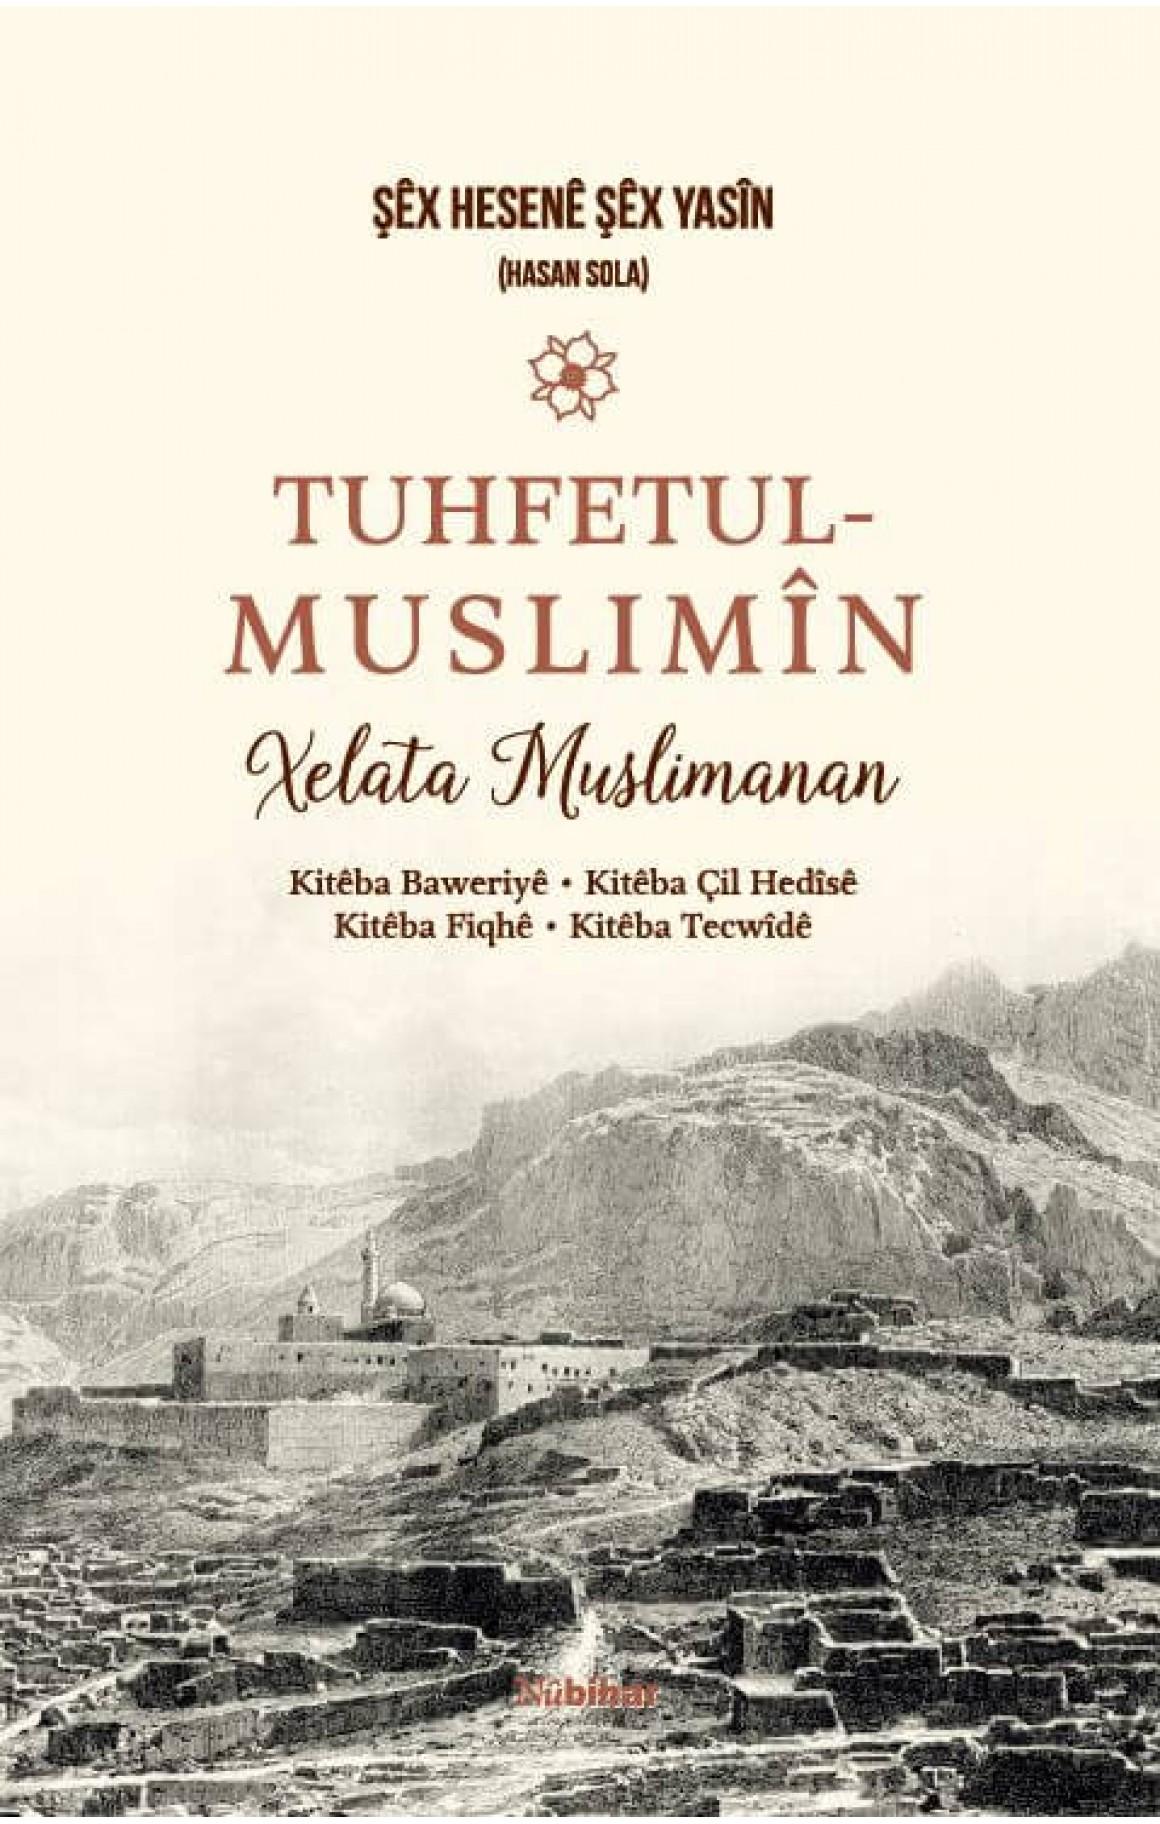 Tuhfetul Muslimîn Xelata Muslimanan